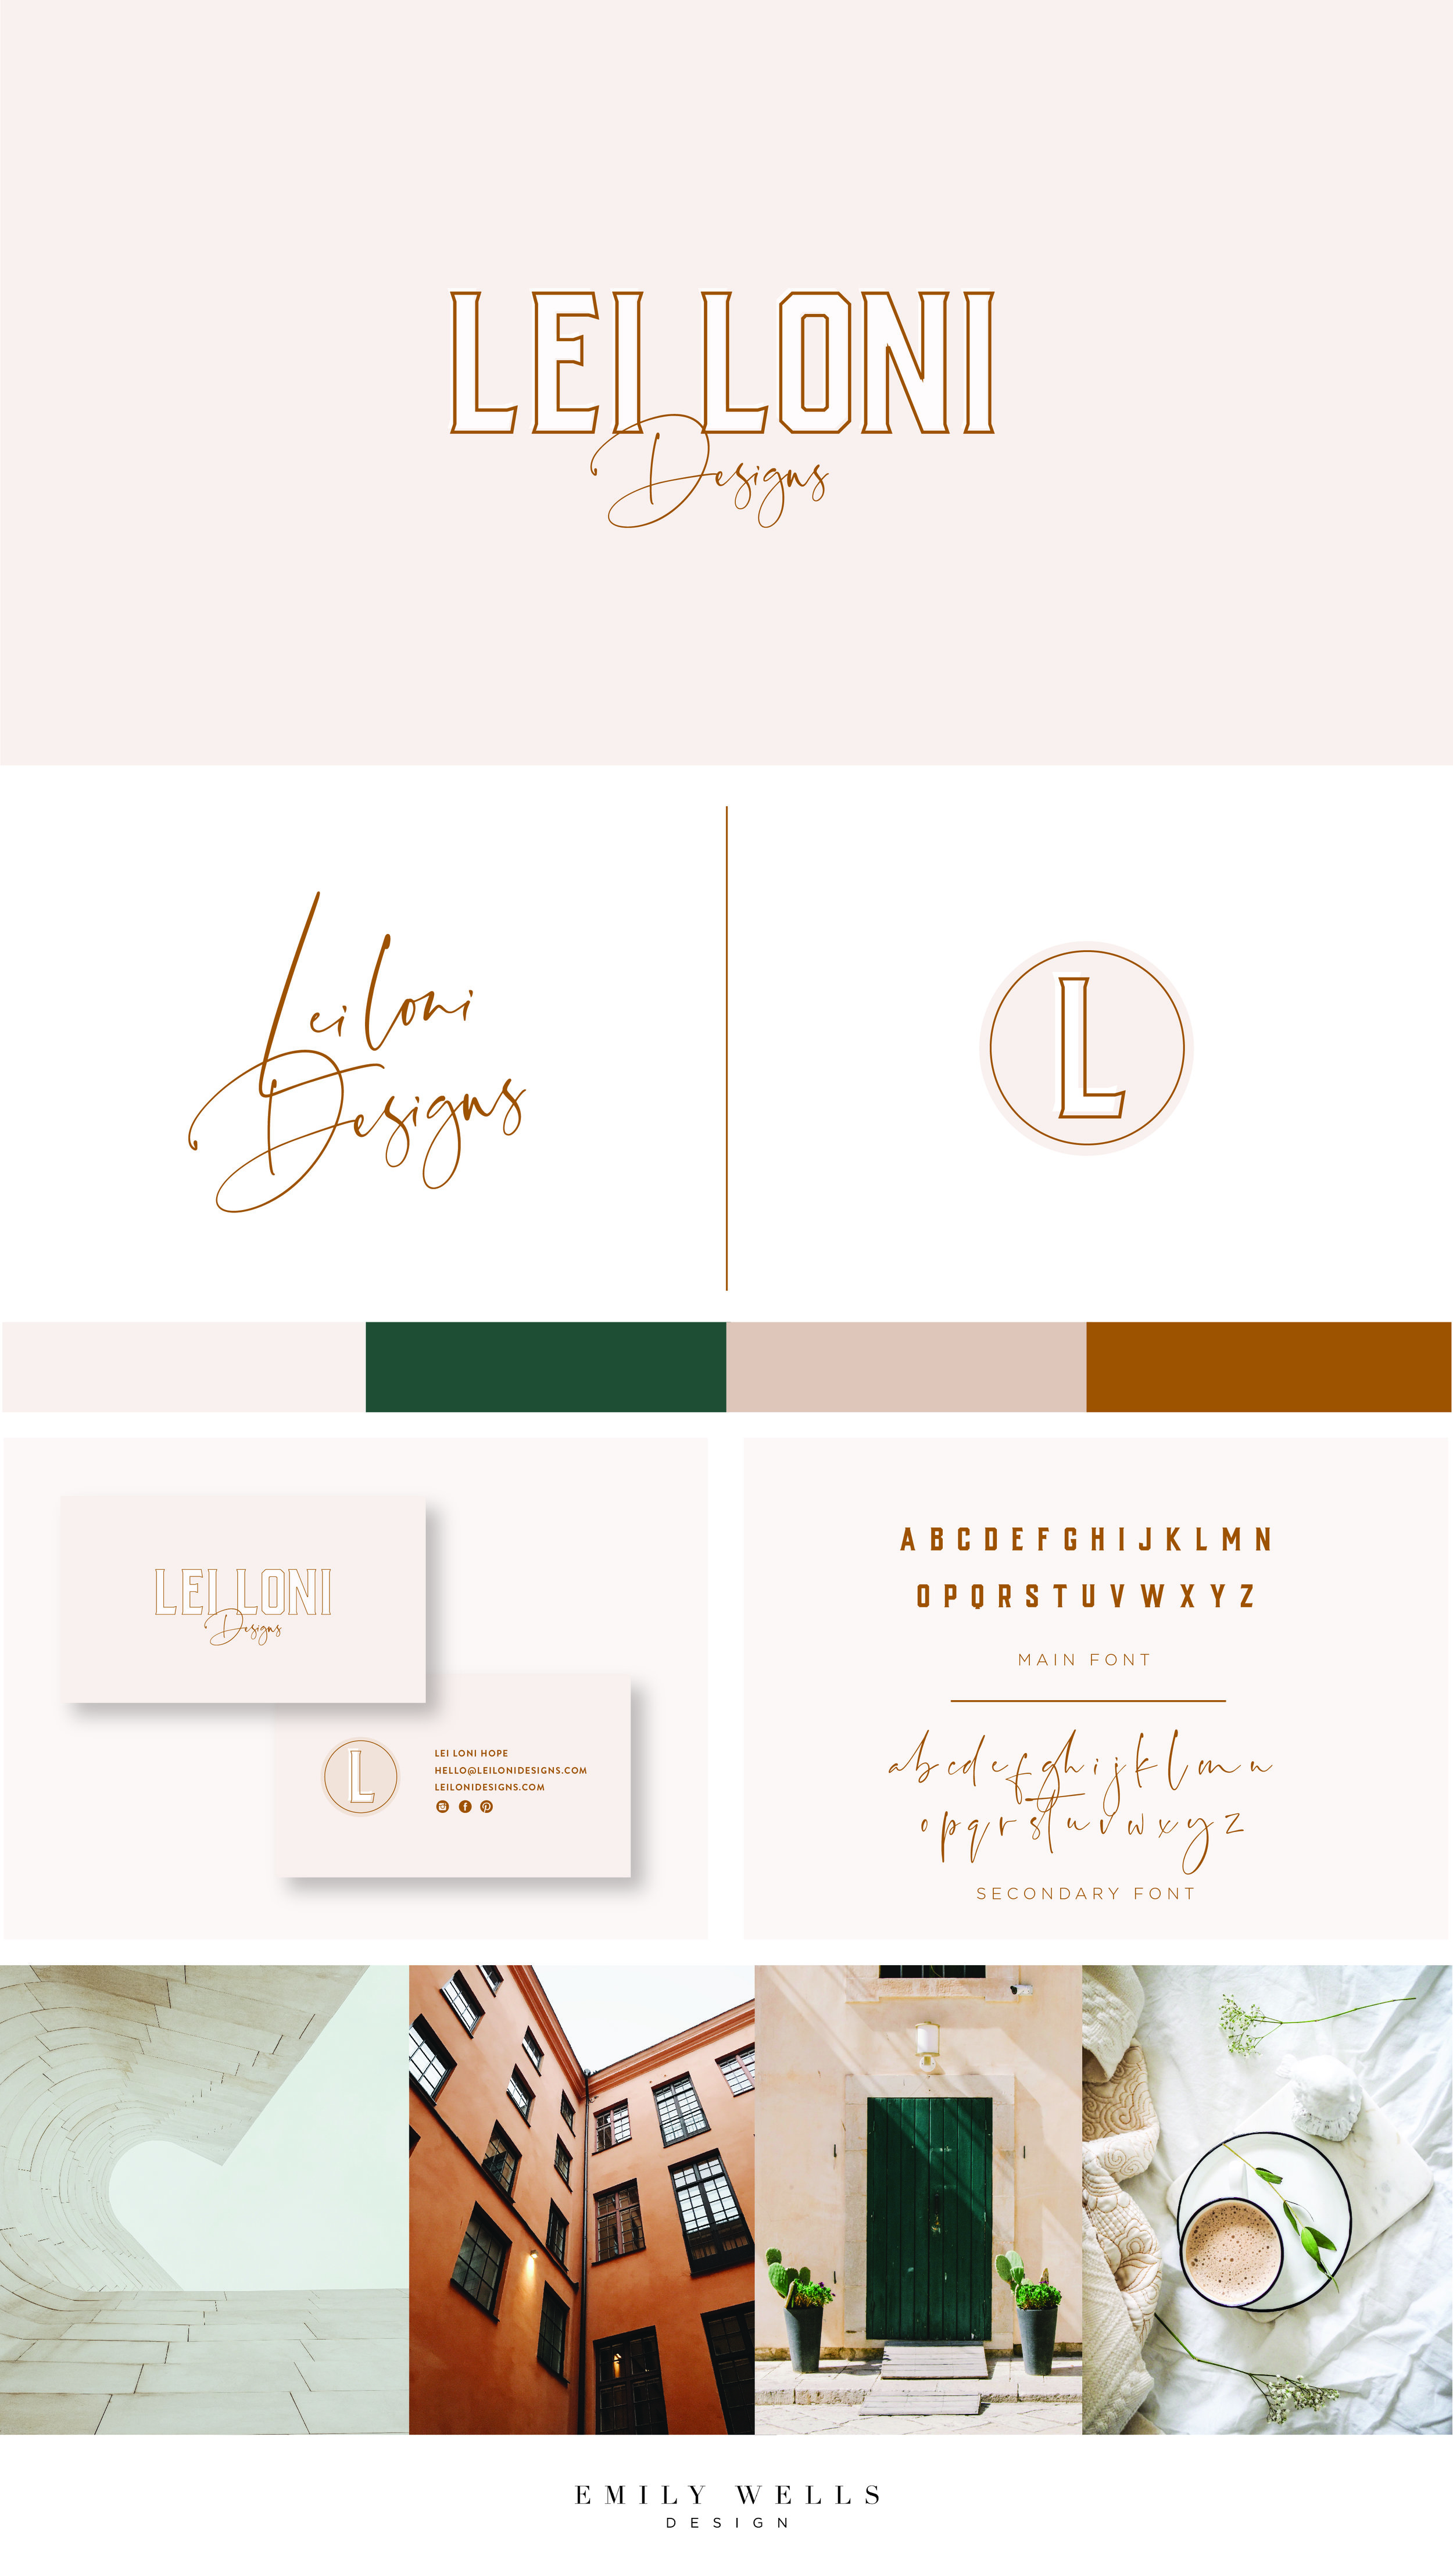 LeiLoni Designs-01.jpg